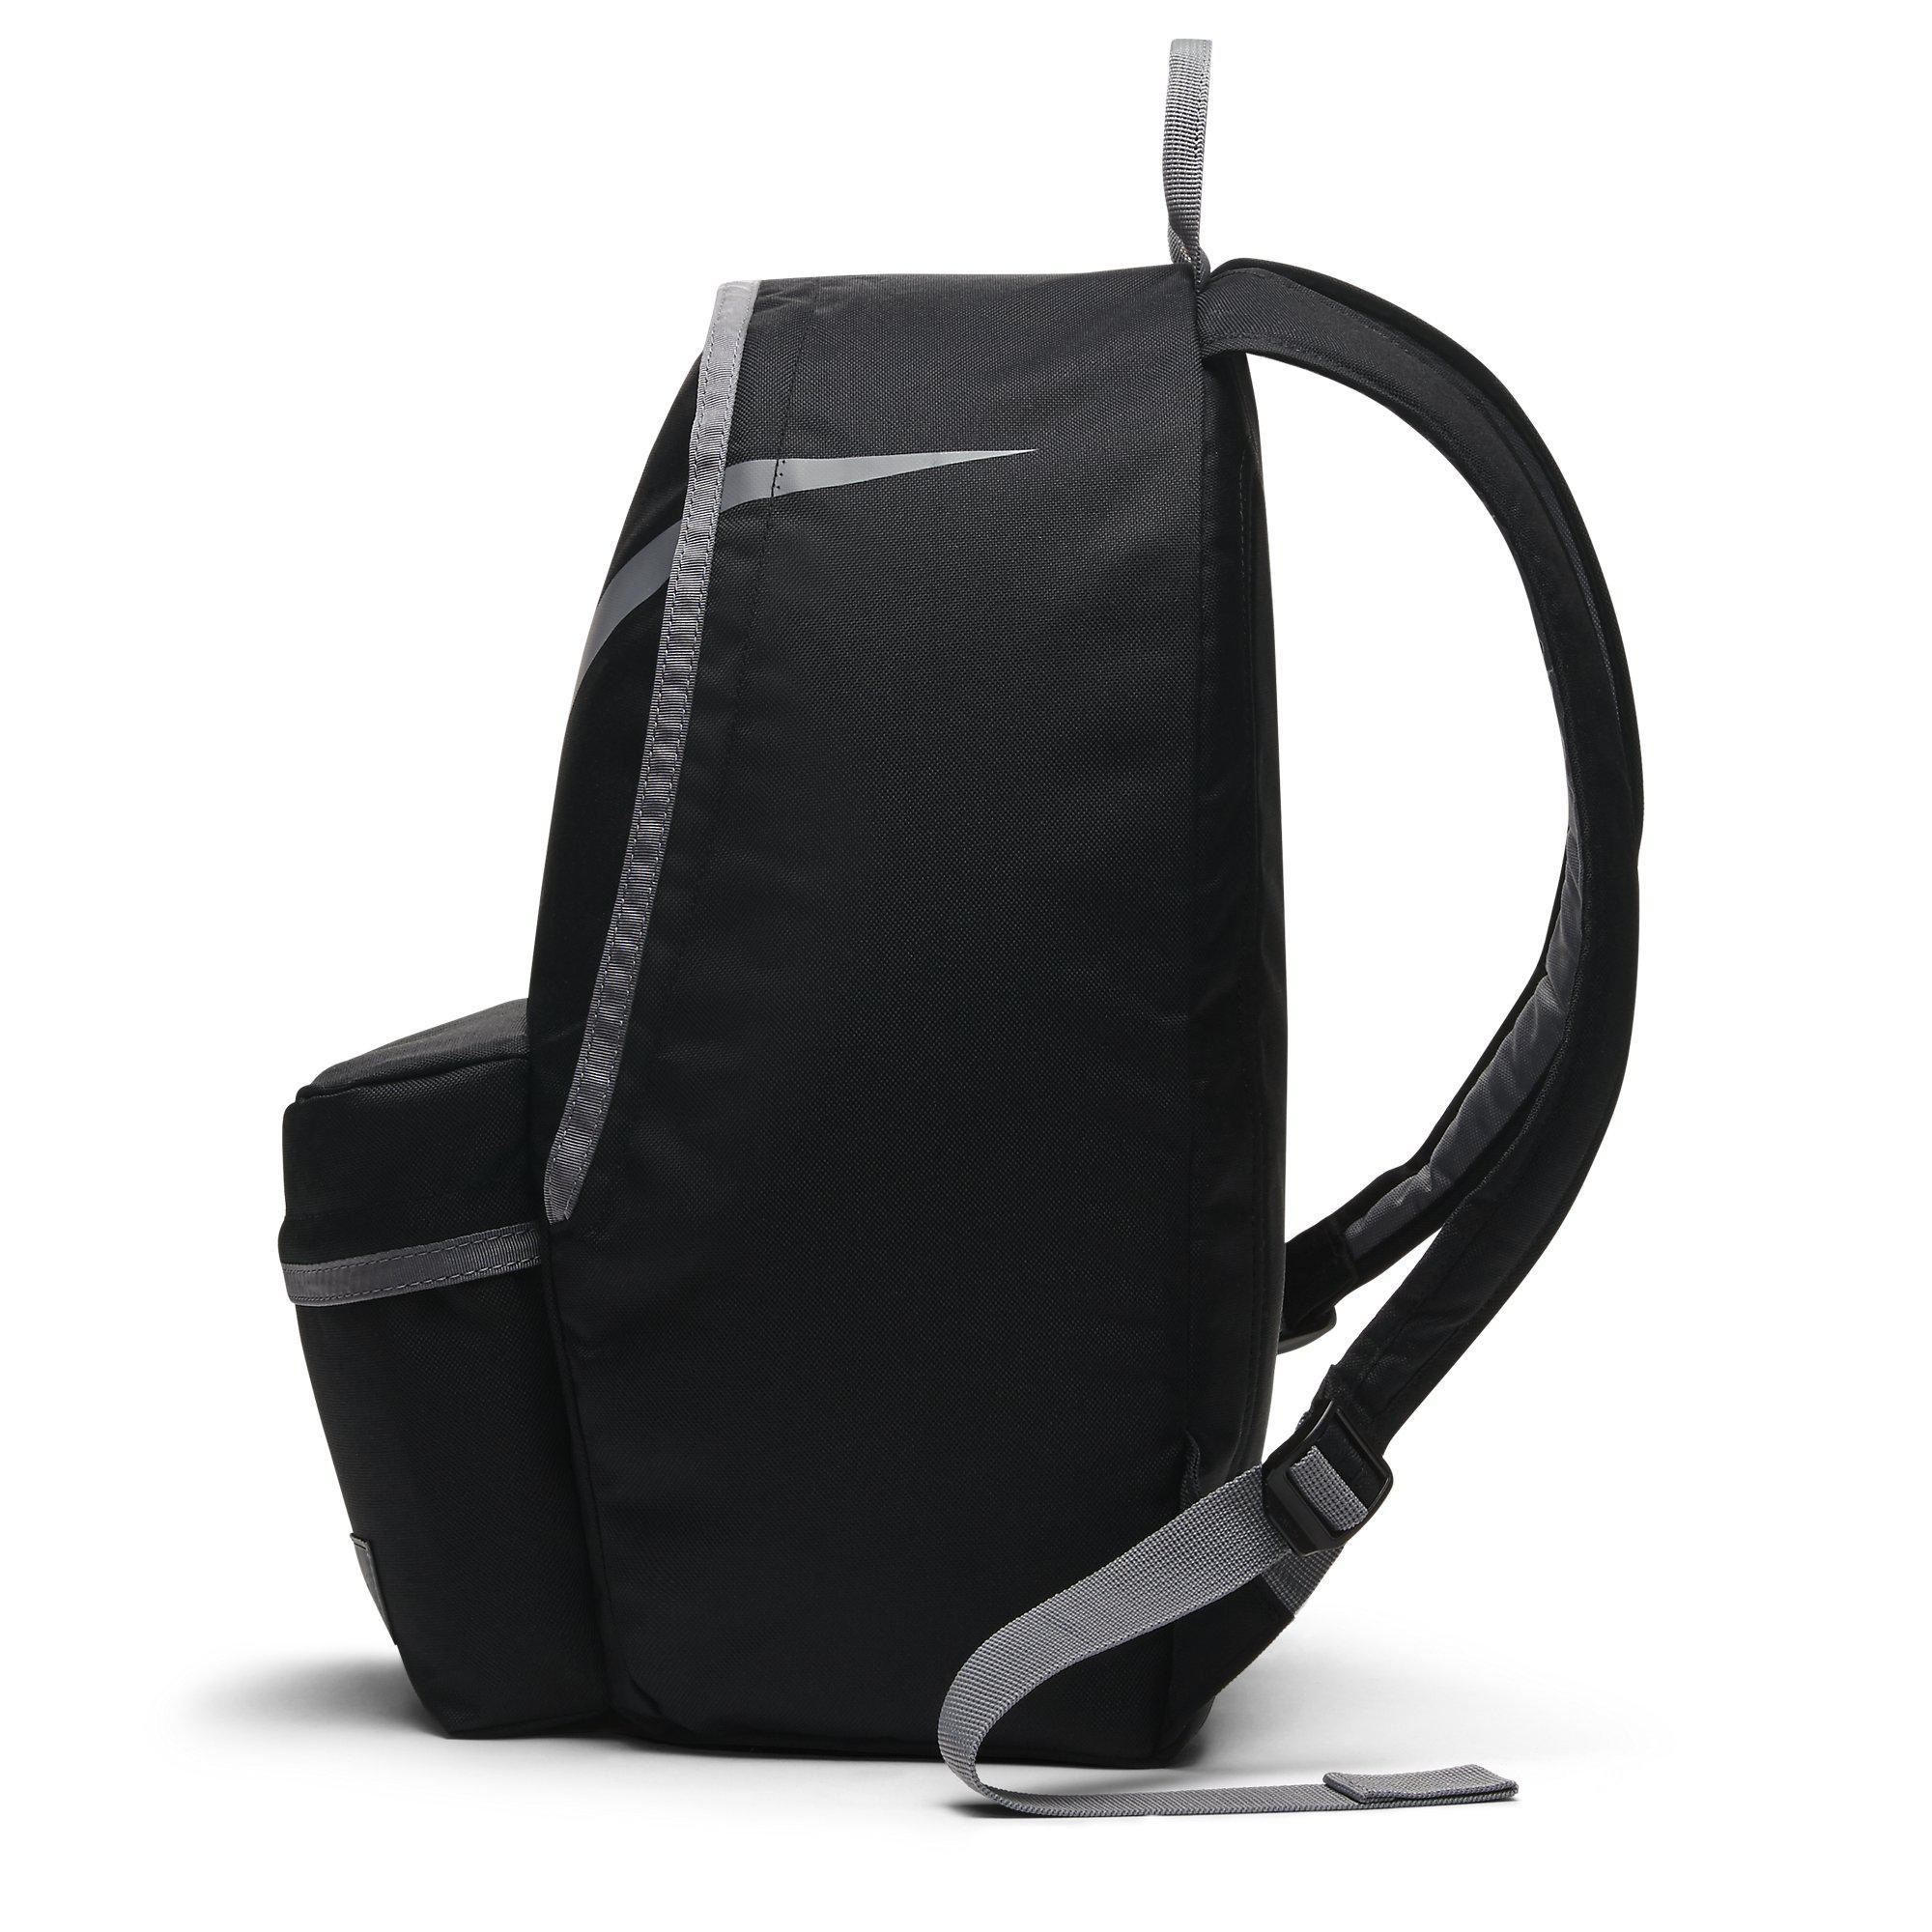 Nike HalfDay Back To School Kids Backpack - Black - Tennisnuts.com 701e5b5bea0c1